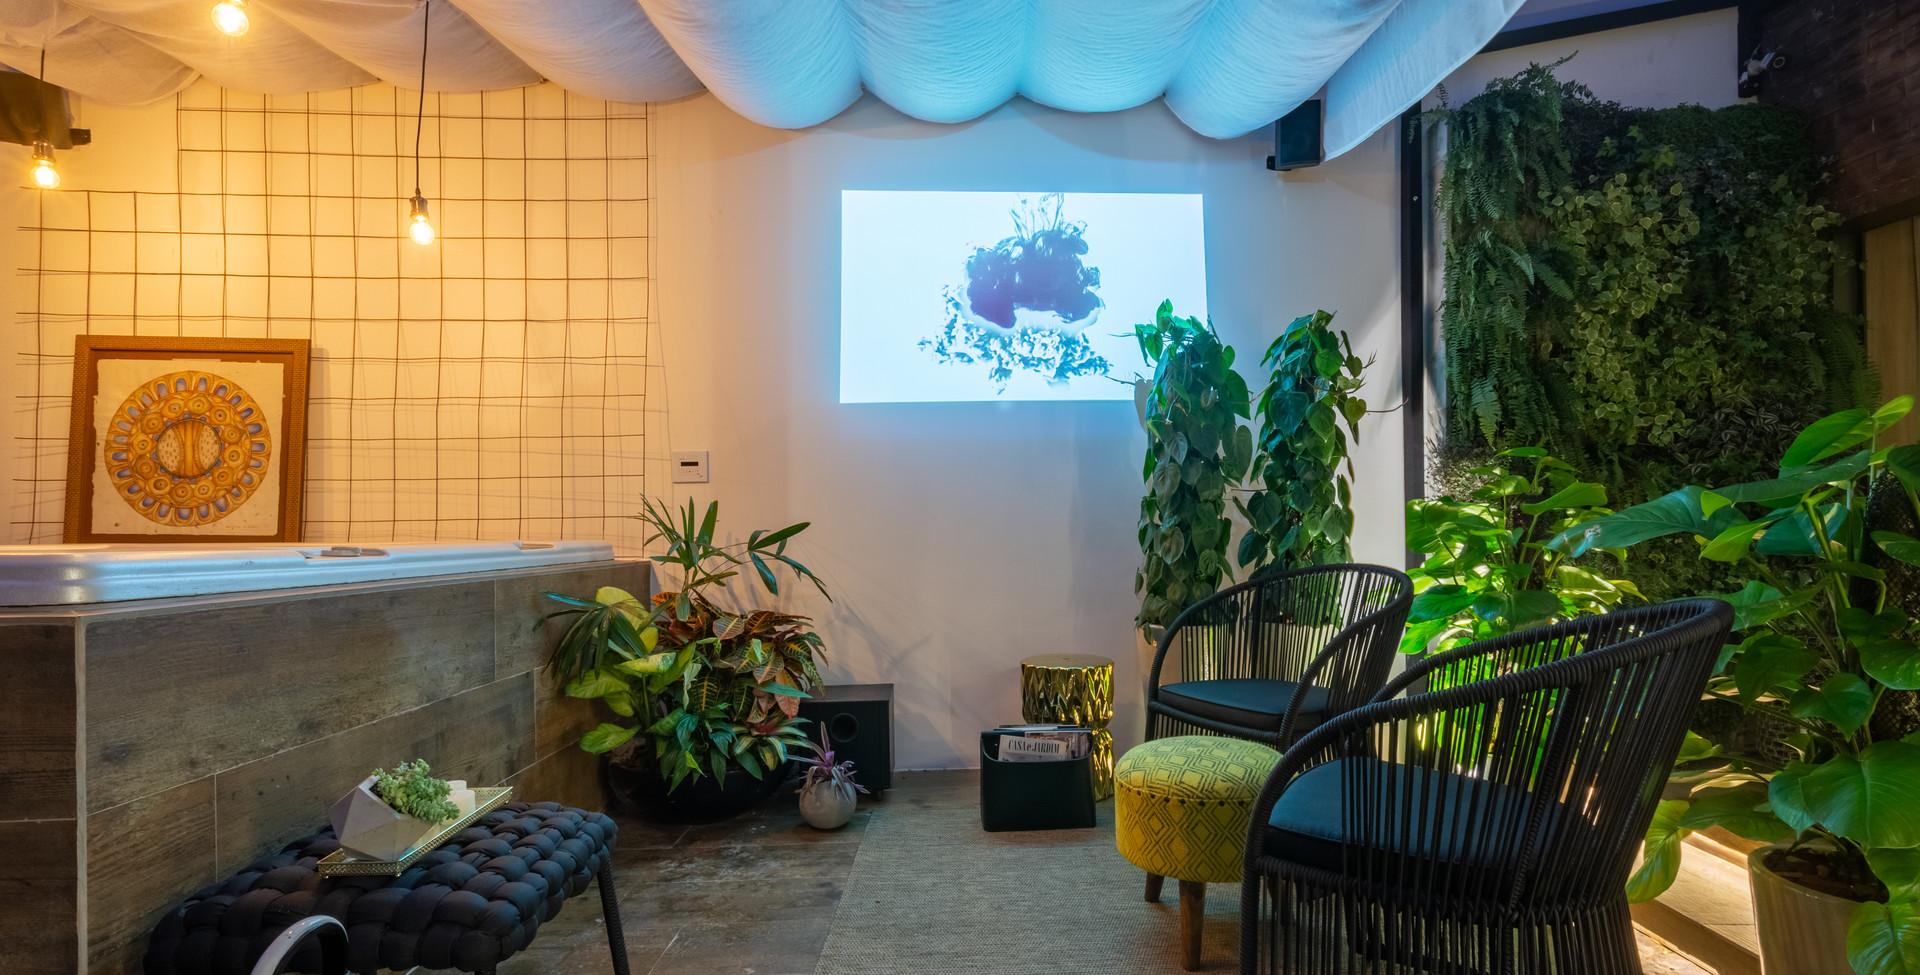 Mostra Decore 2019 Isabella Amado-17.JPG